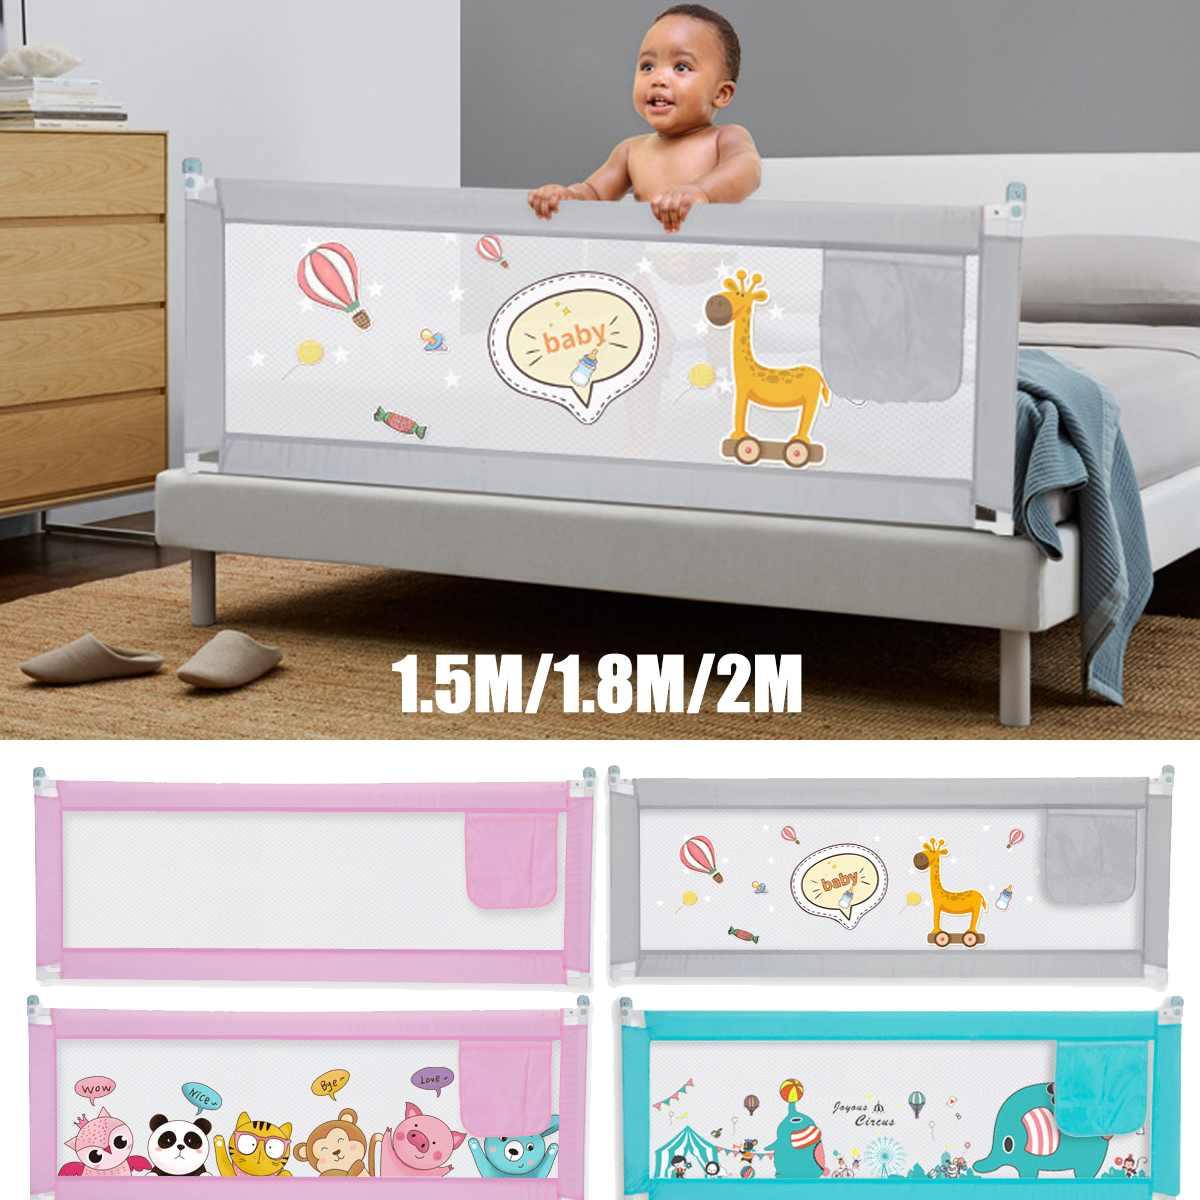 1.5M/1.8M/2M Adjustable Baby Playpen Bed Safety Rails For Babies Children Fences Fence Baby Safety Gate Crib Barrier For Infants